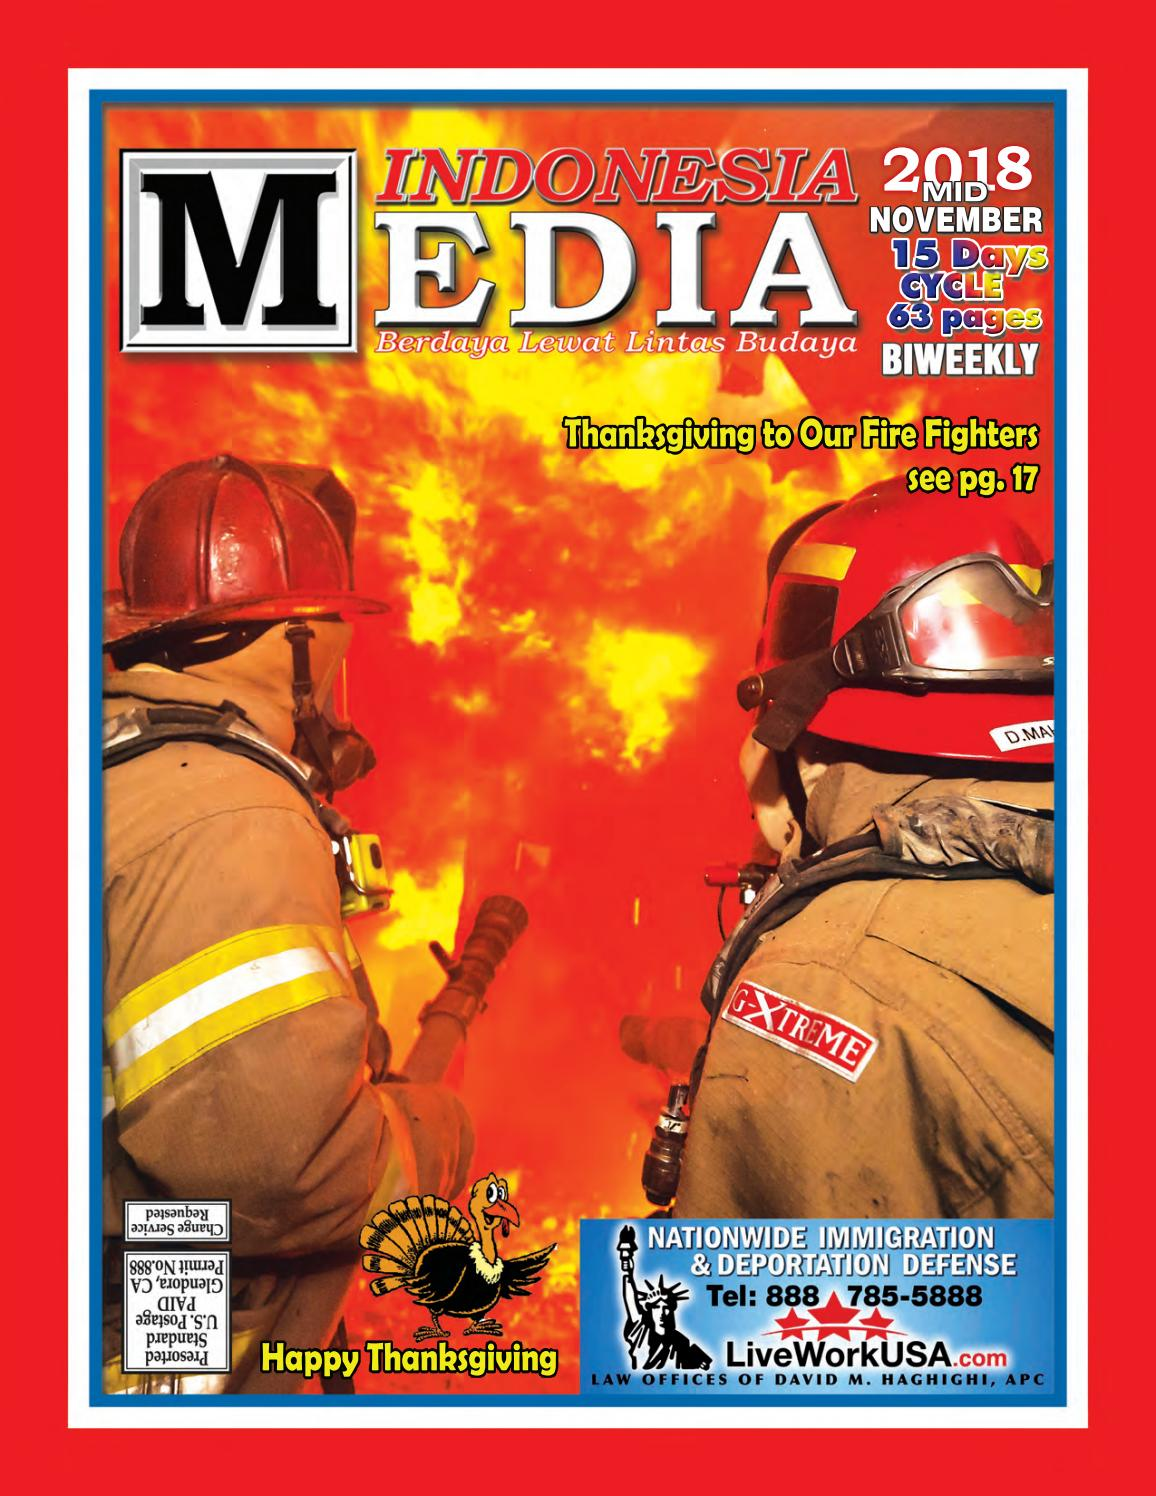 Indonesia Media Issue Mid November 2018 By Issuu Produk Ukm Bumn Suscho Sus Coklat Surabaya